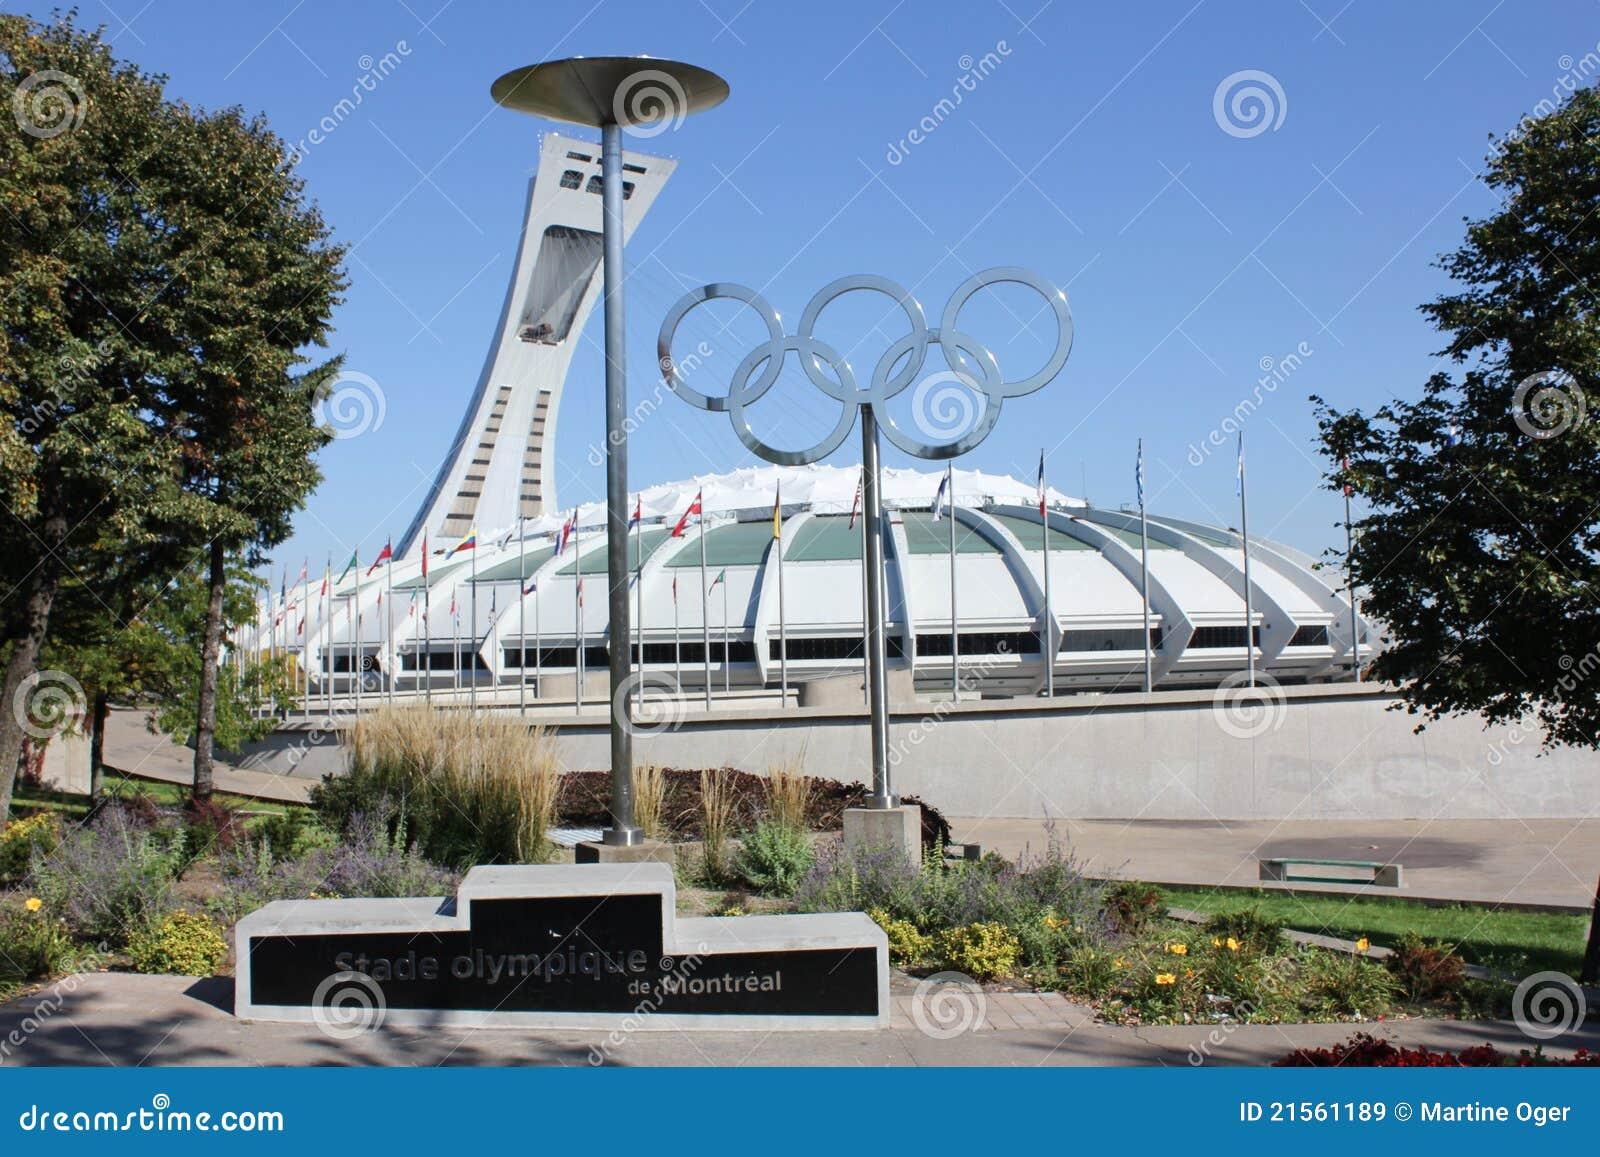 стадион montreal олимпийский